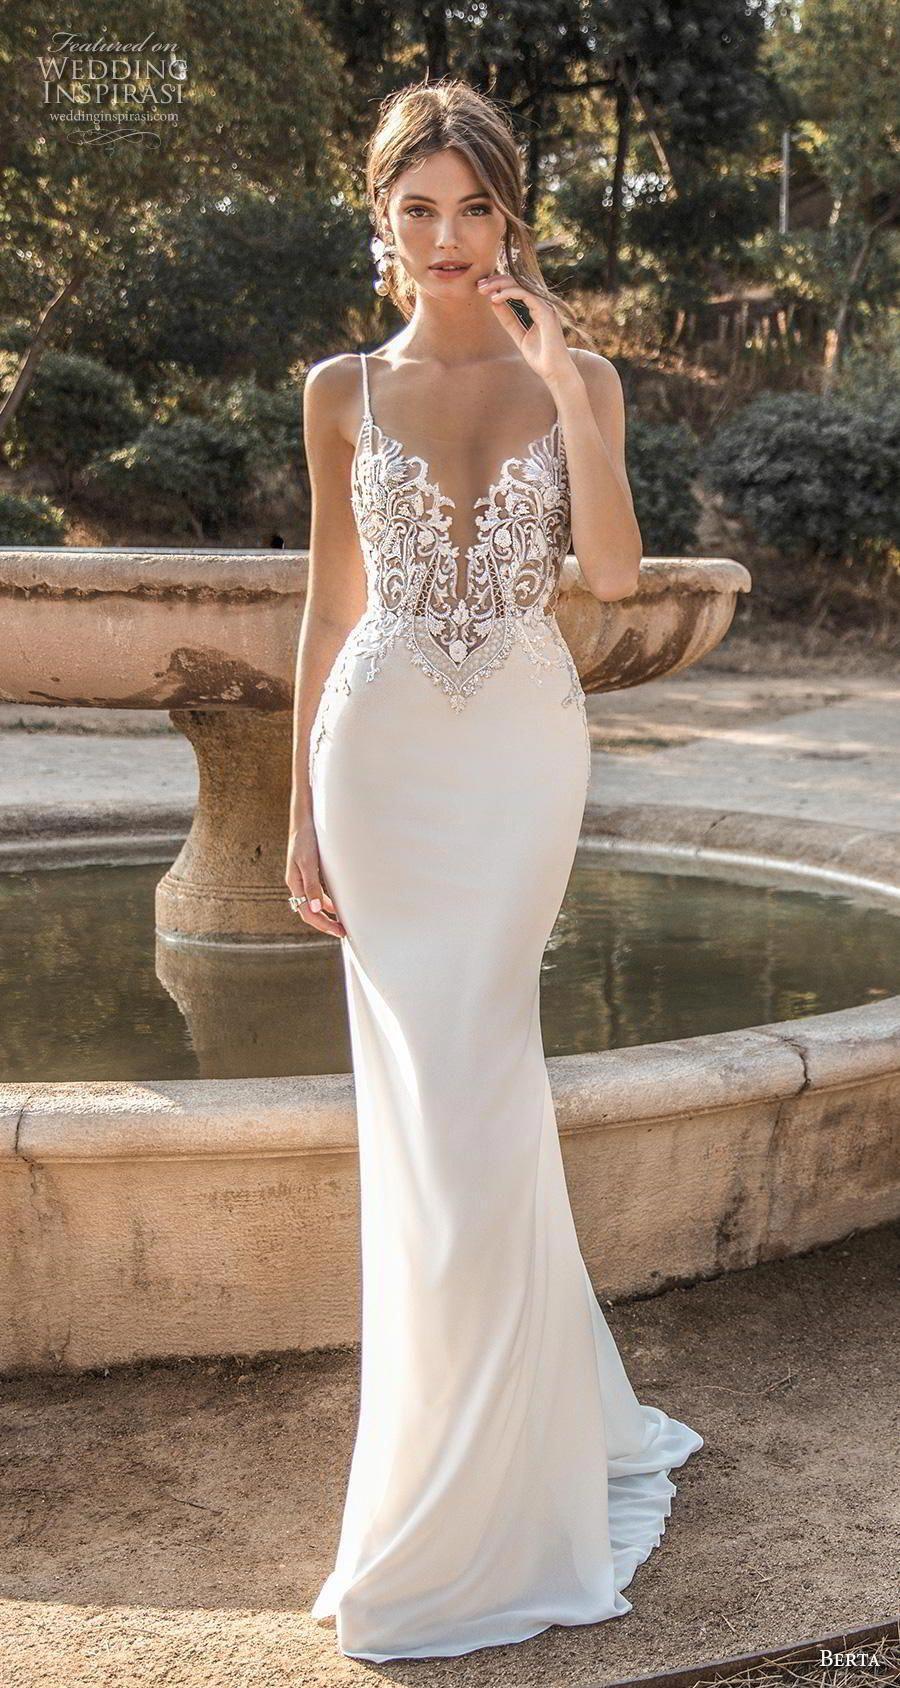 Abiti Da Sposa Wish.When You Initially Go Purchasing Wedding Gowns You Will Wish To